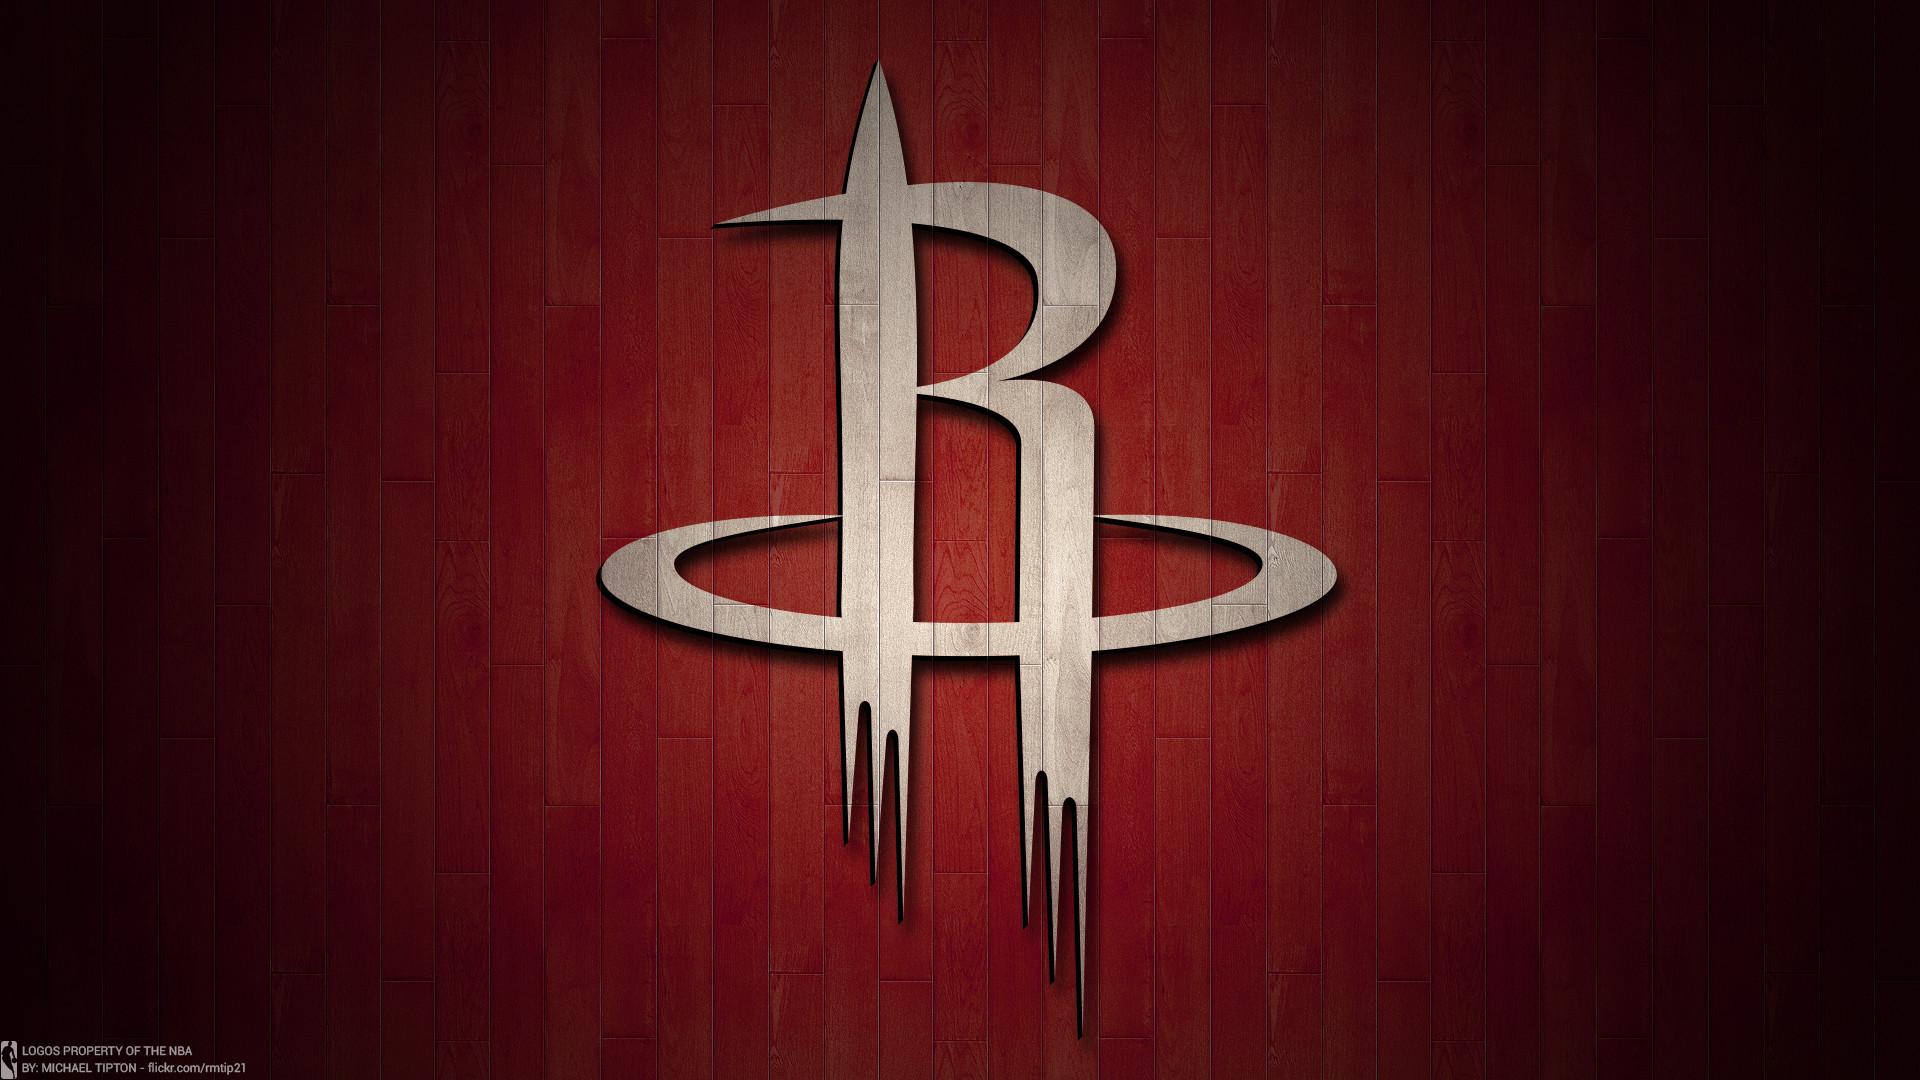 HOUSTON ROCKETS basketball nba (40) wallpaper background